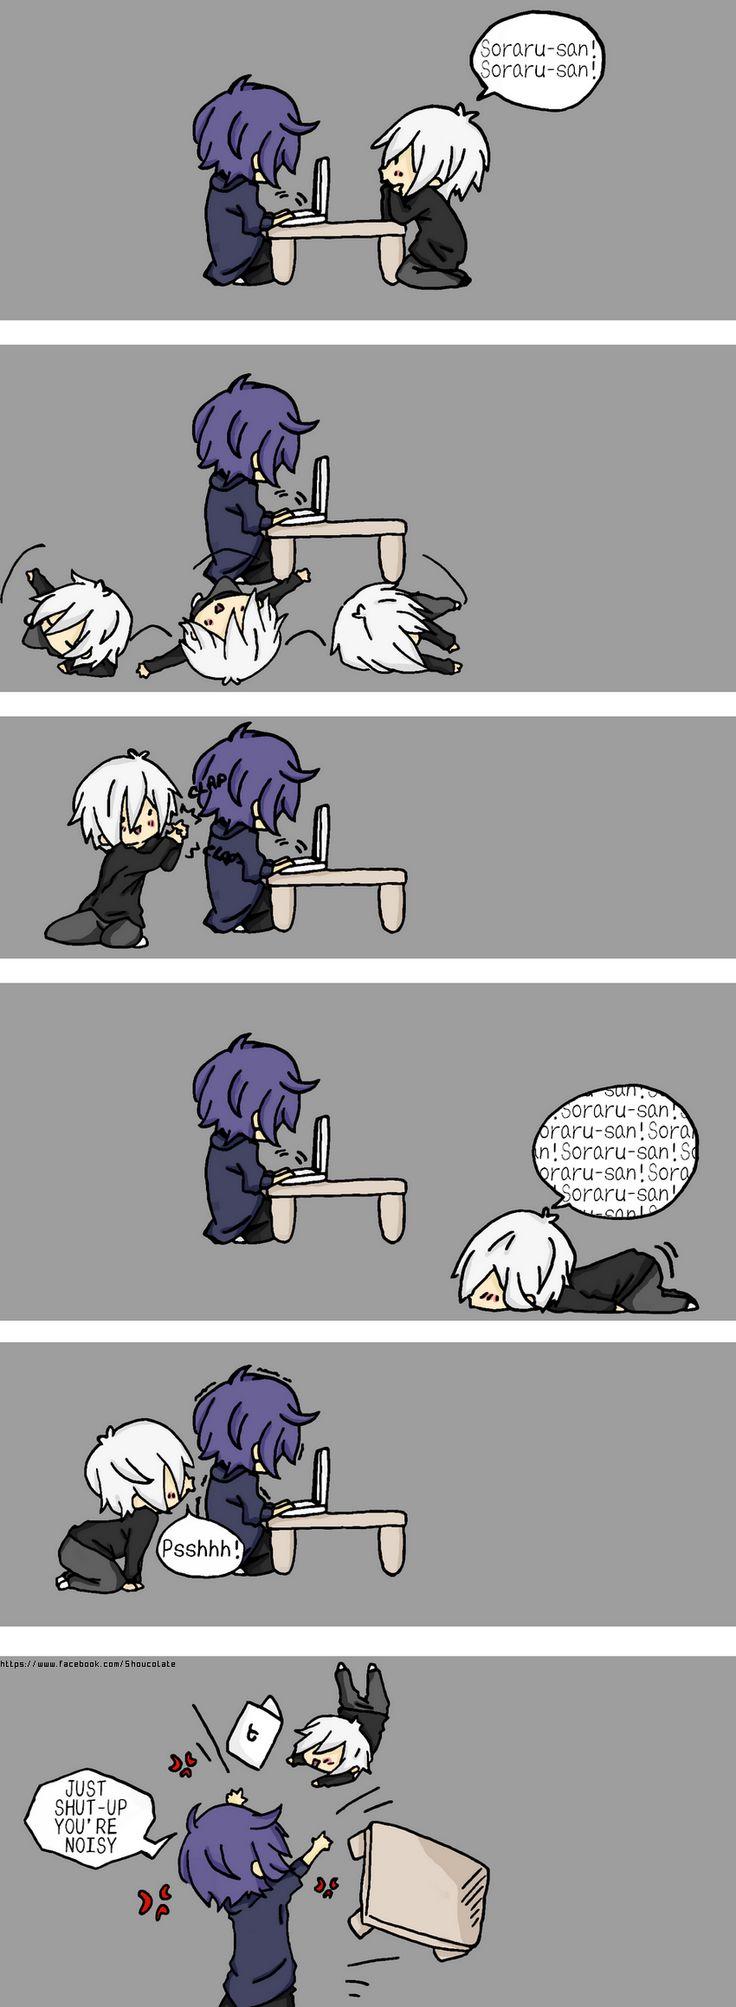 Mafumafu and Soraru. This is just too cute X3